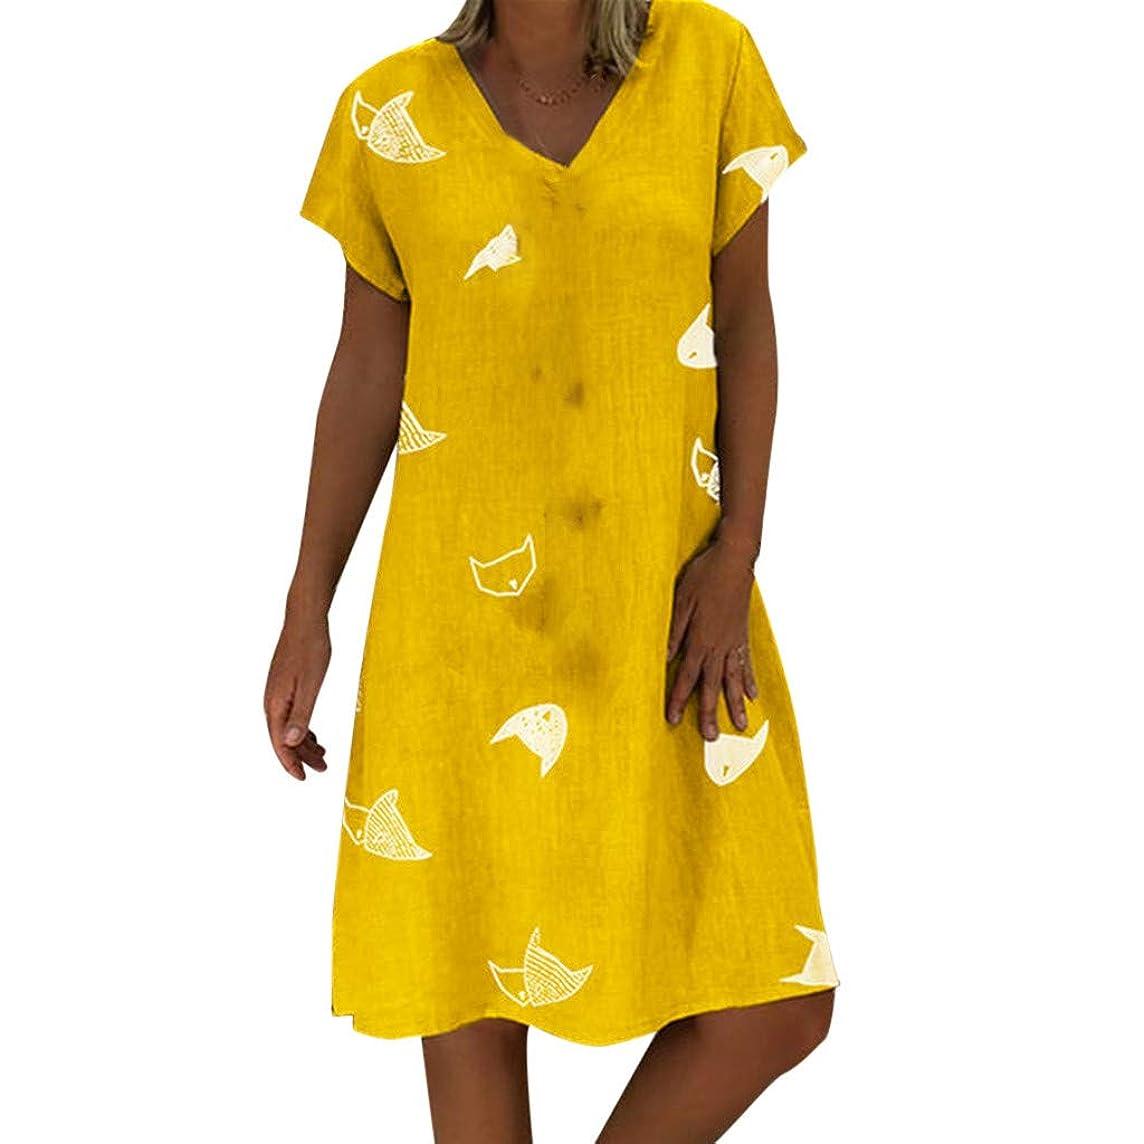 Sagton Tshirt Dresses for Women Print V-Neck Short Sleeve T-Shirt Dress Mini Dress